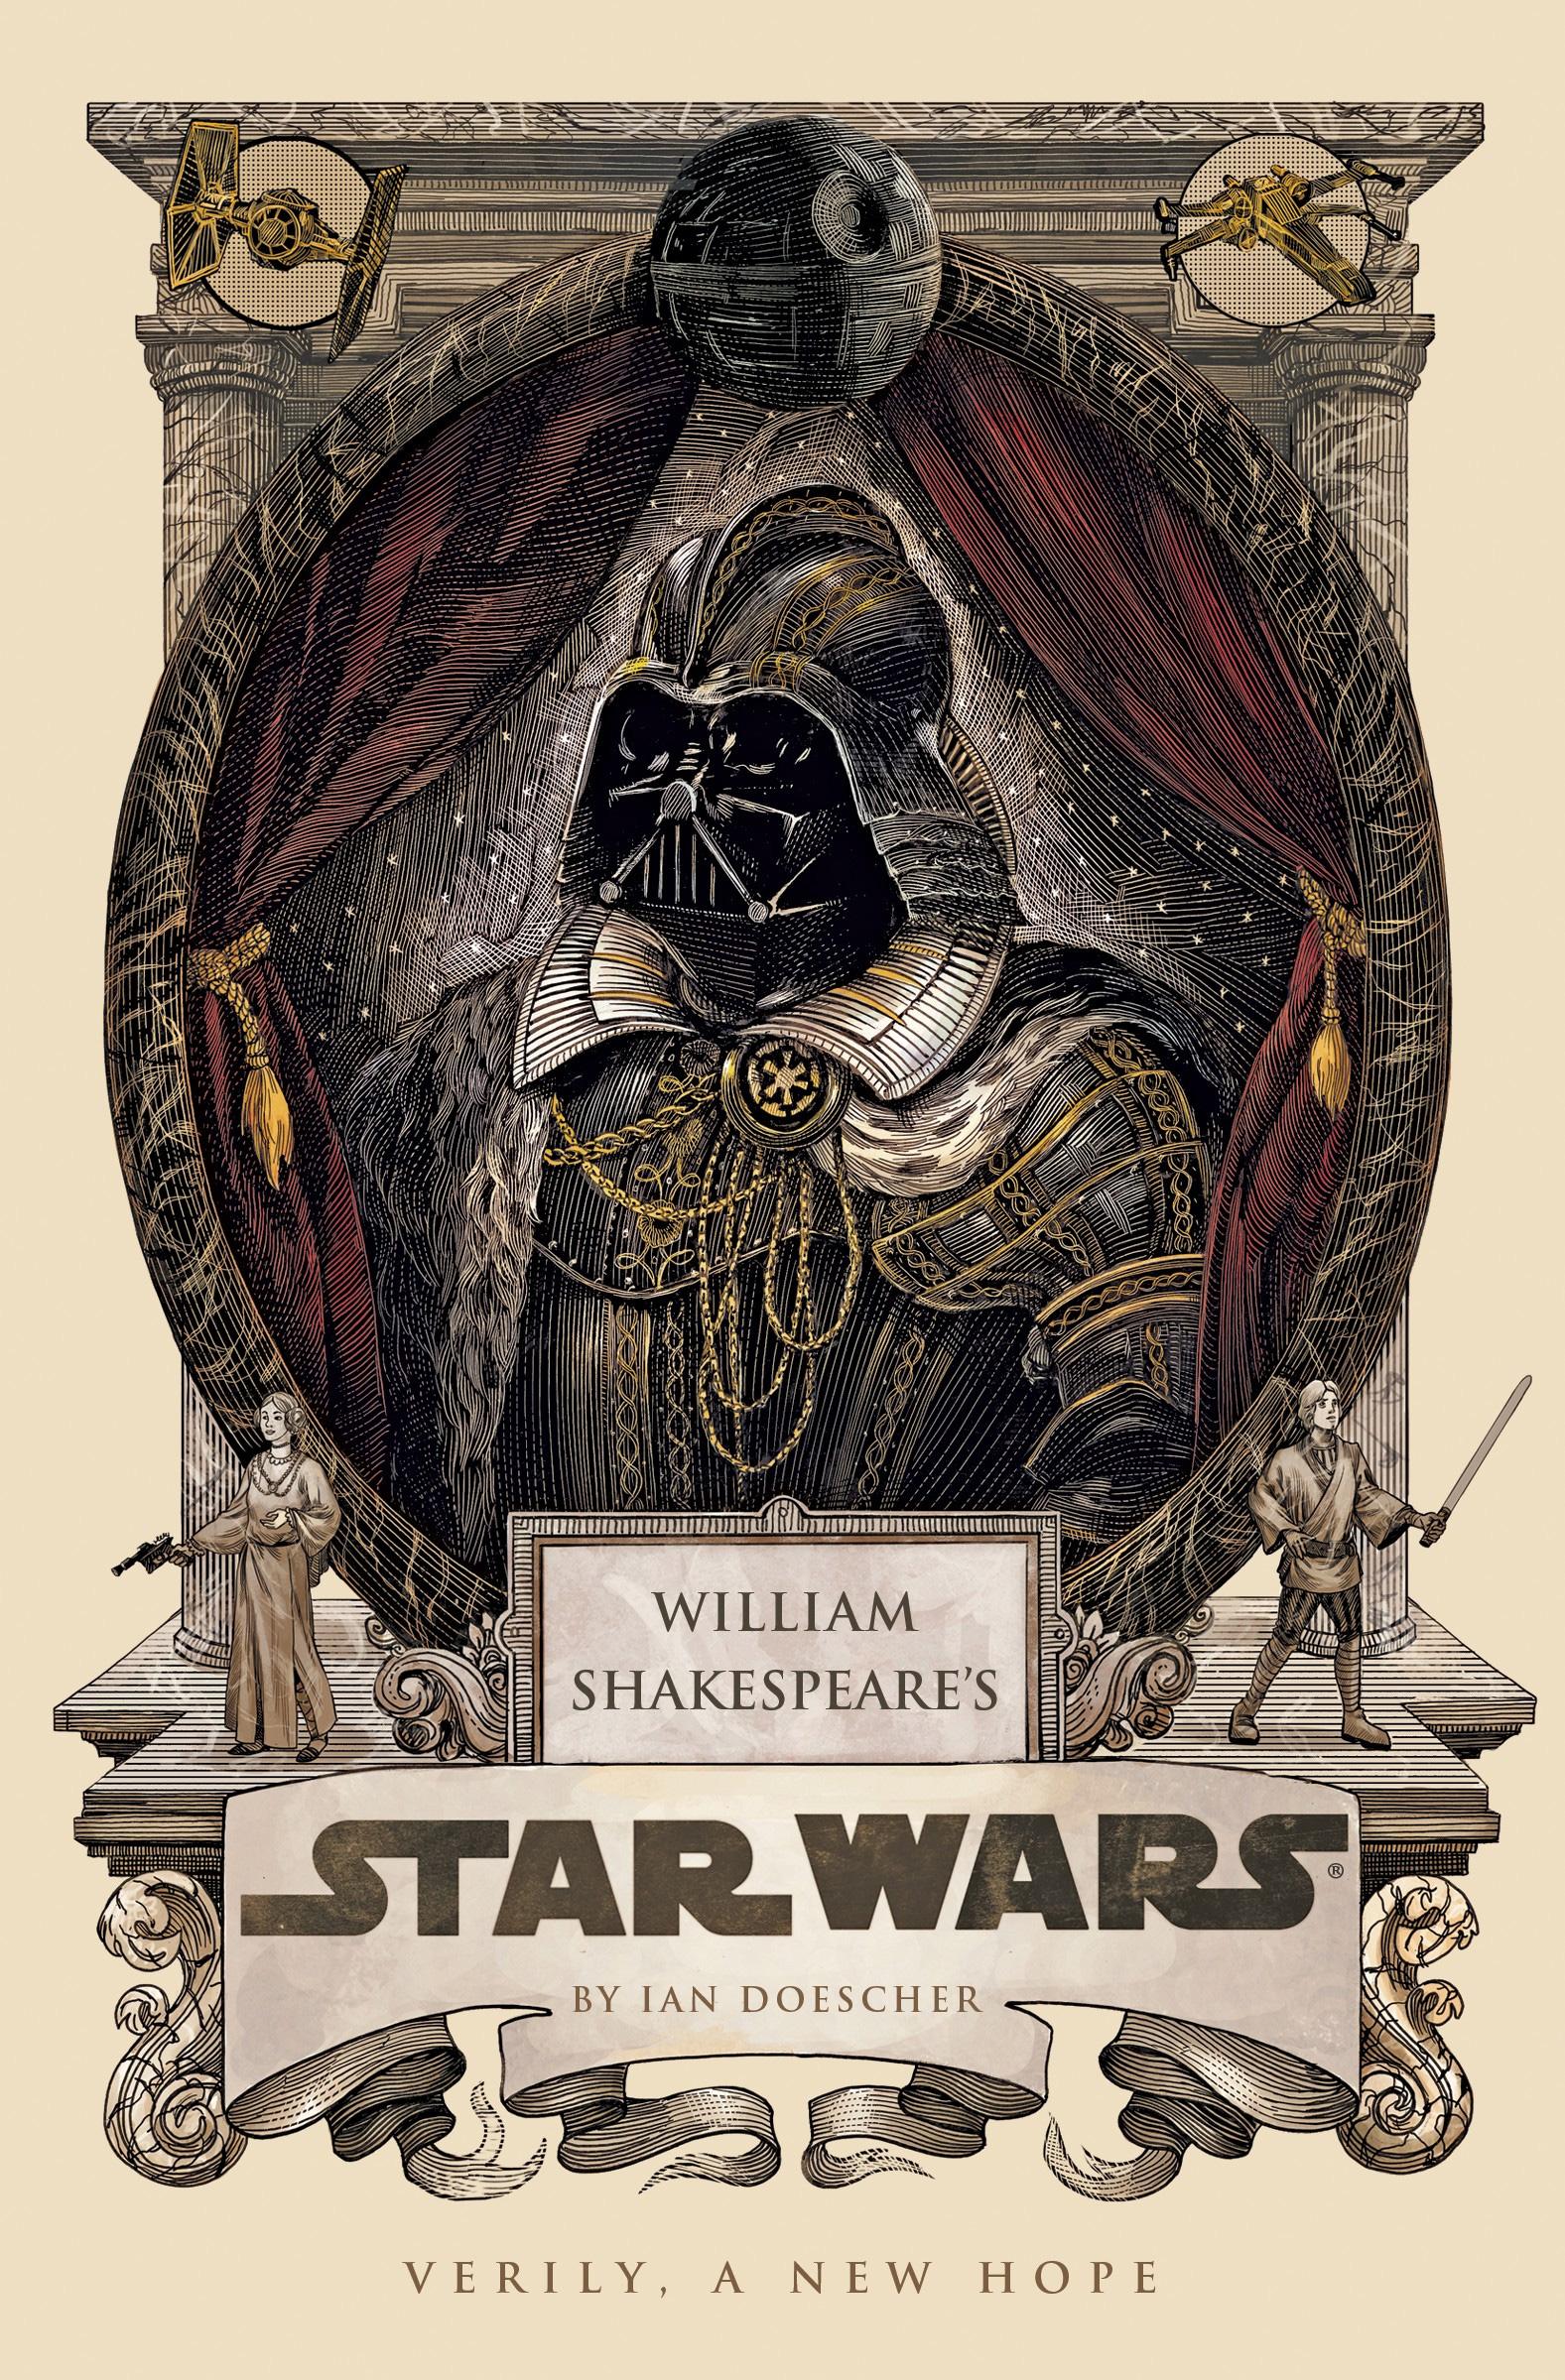 star-wars-retold-in-the-style-of-william-shakespeare-header.jpg